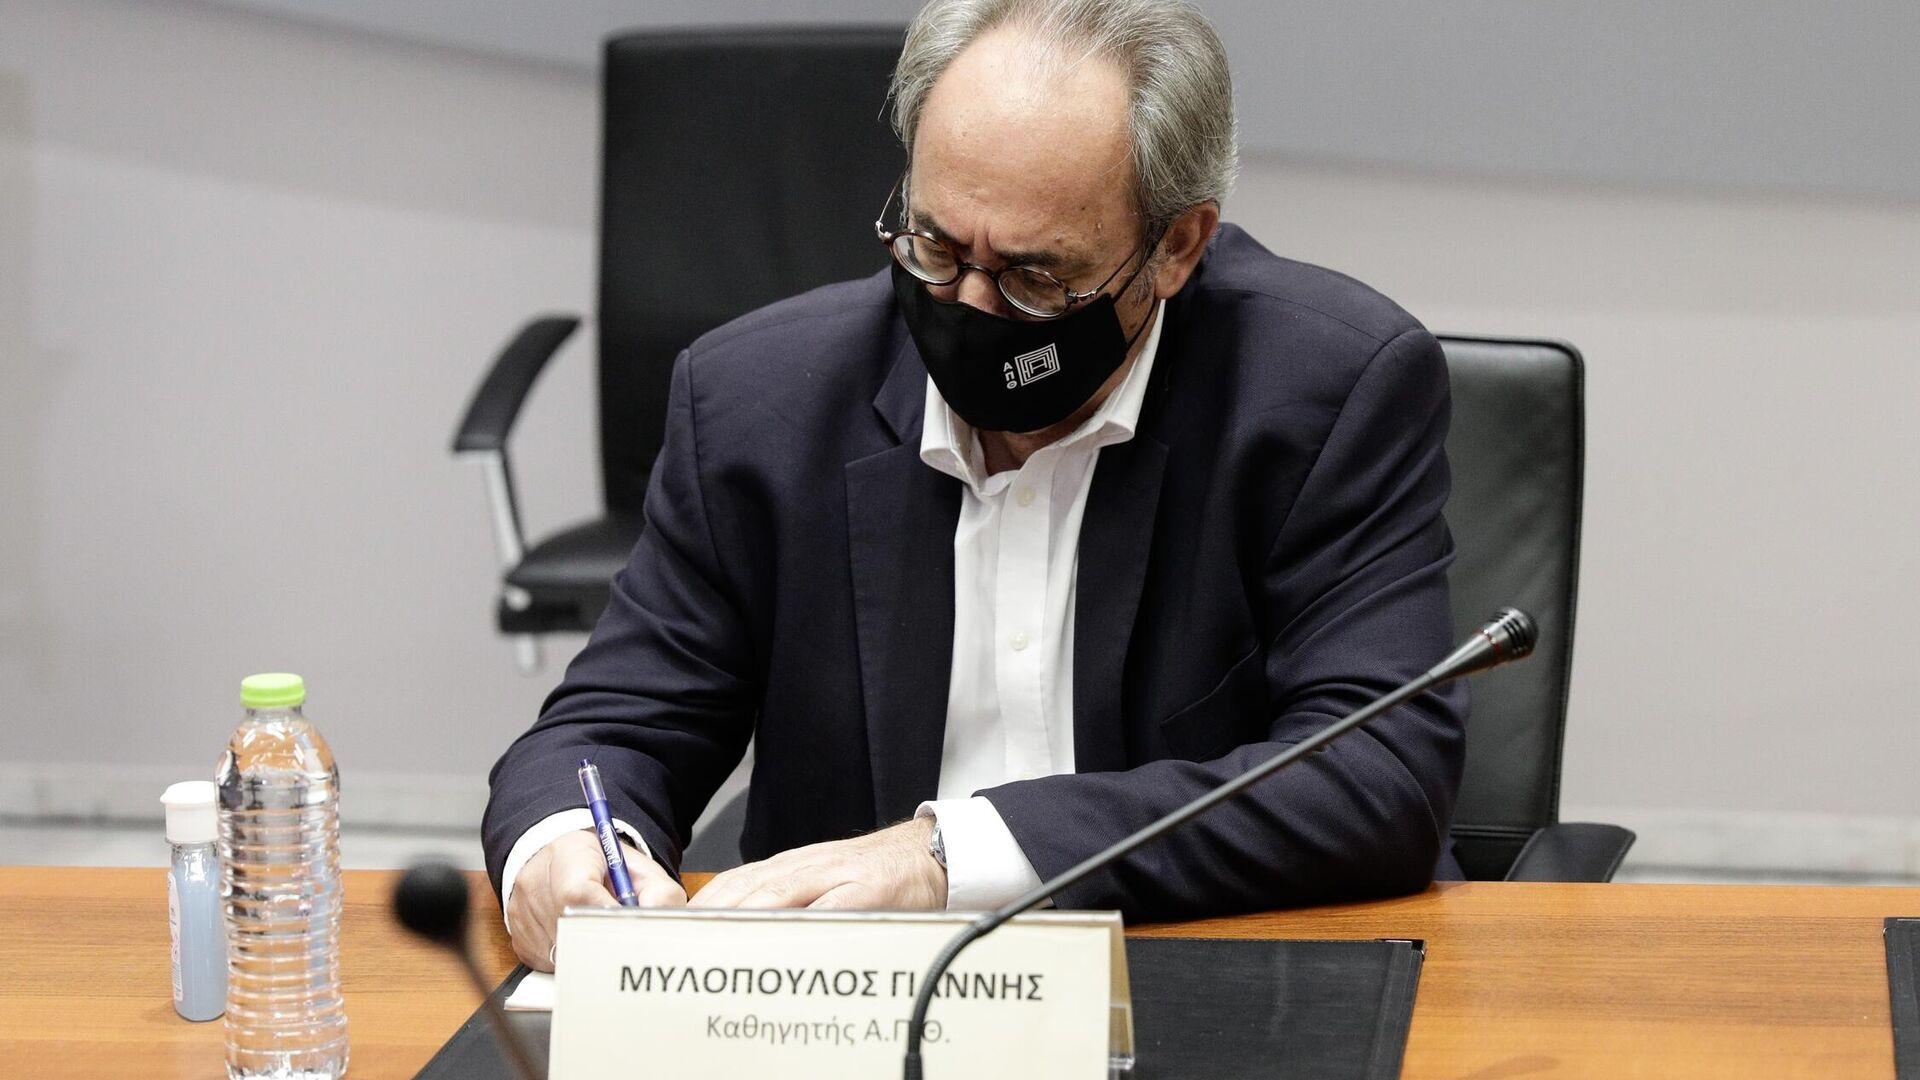 O Γιάννης Μυλόπουλος - Sputnik Ελλάδα, 1920, 13.09.2021